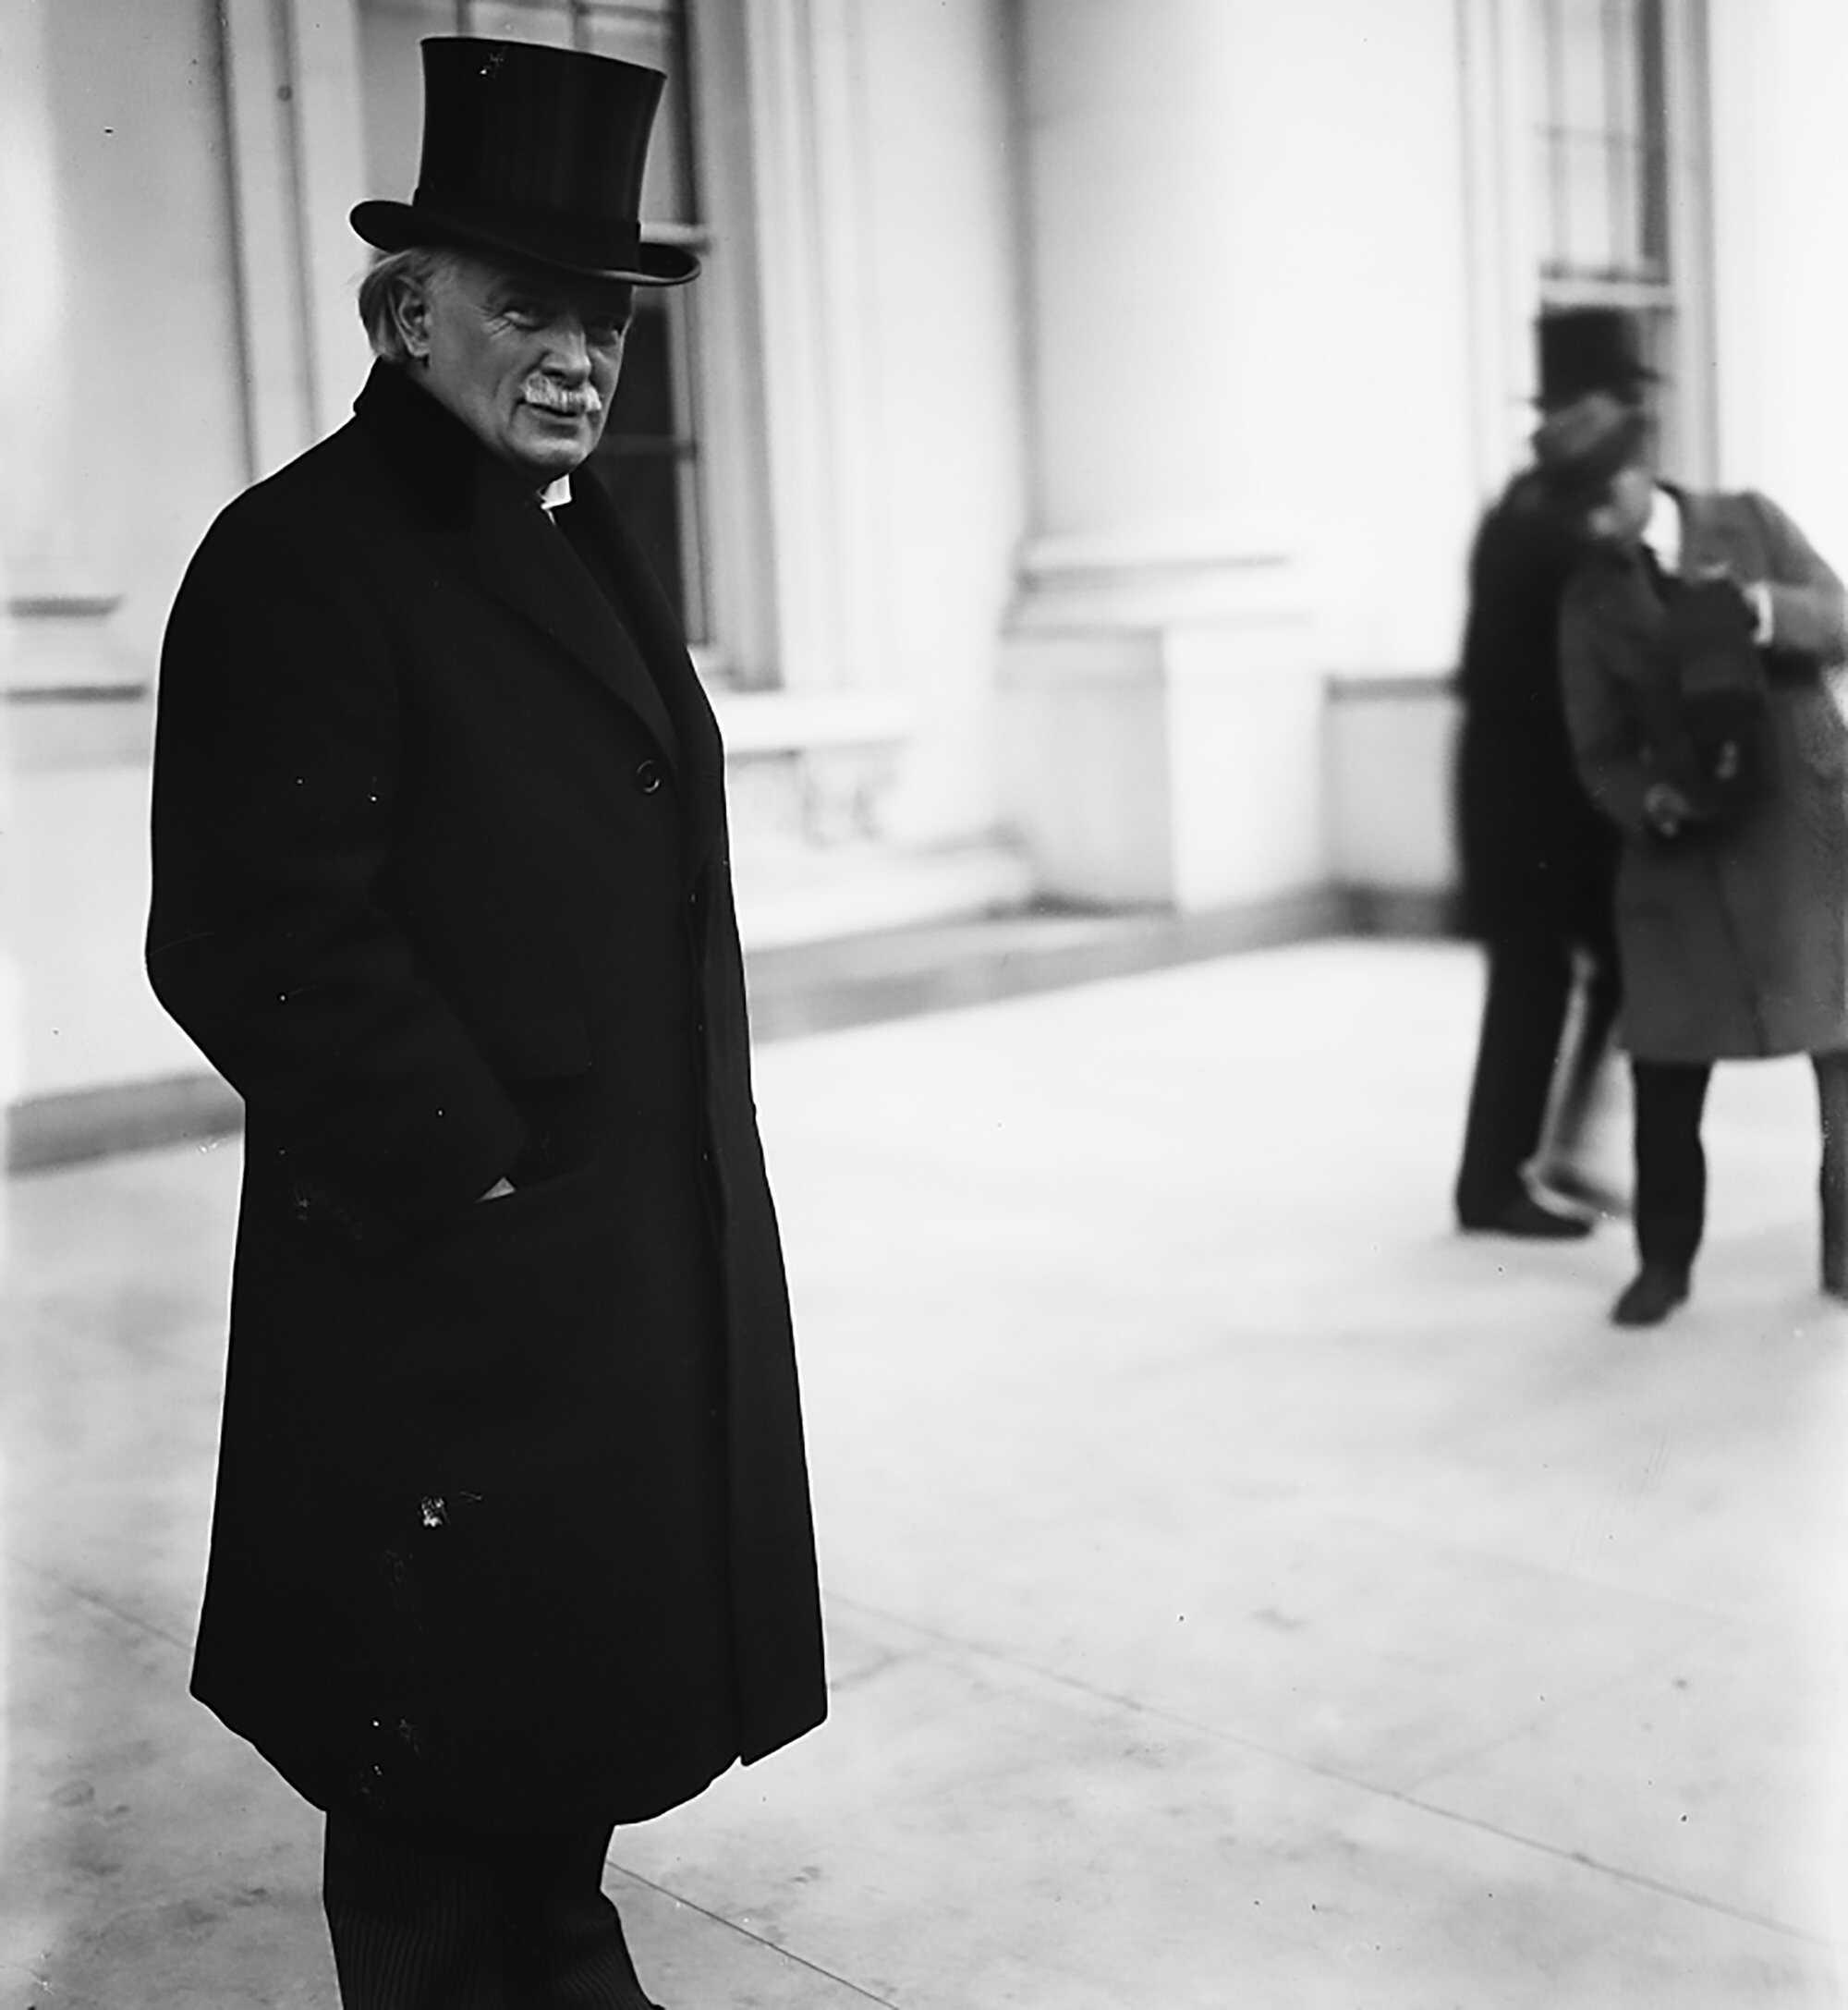 Wilson-David-Lloyd-George-at-White-House,-Washington,-D.C.-1923-LOC.jpg